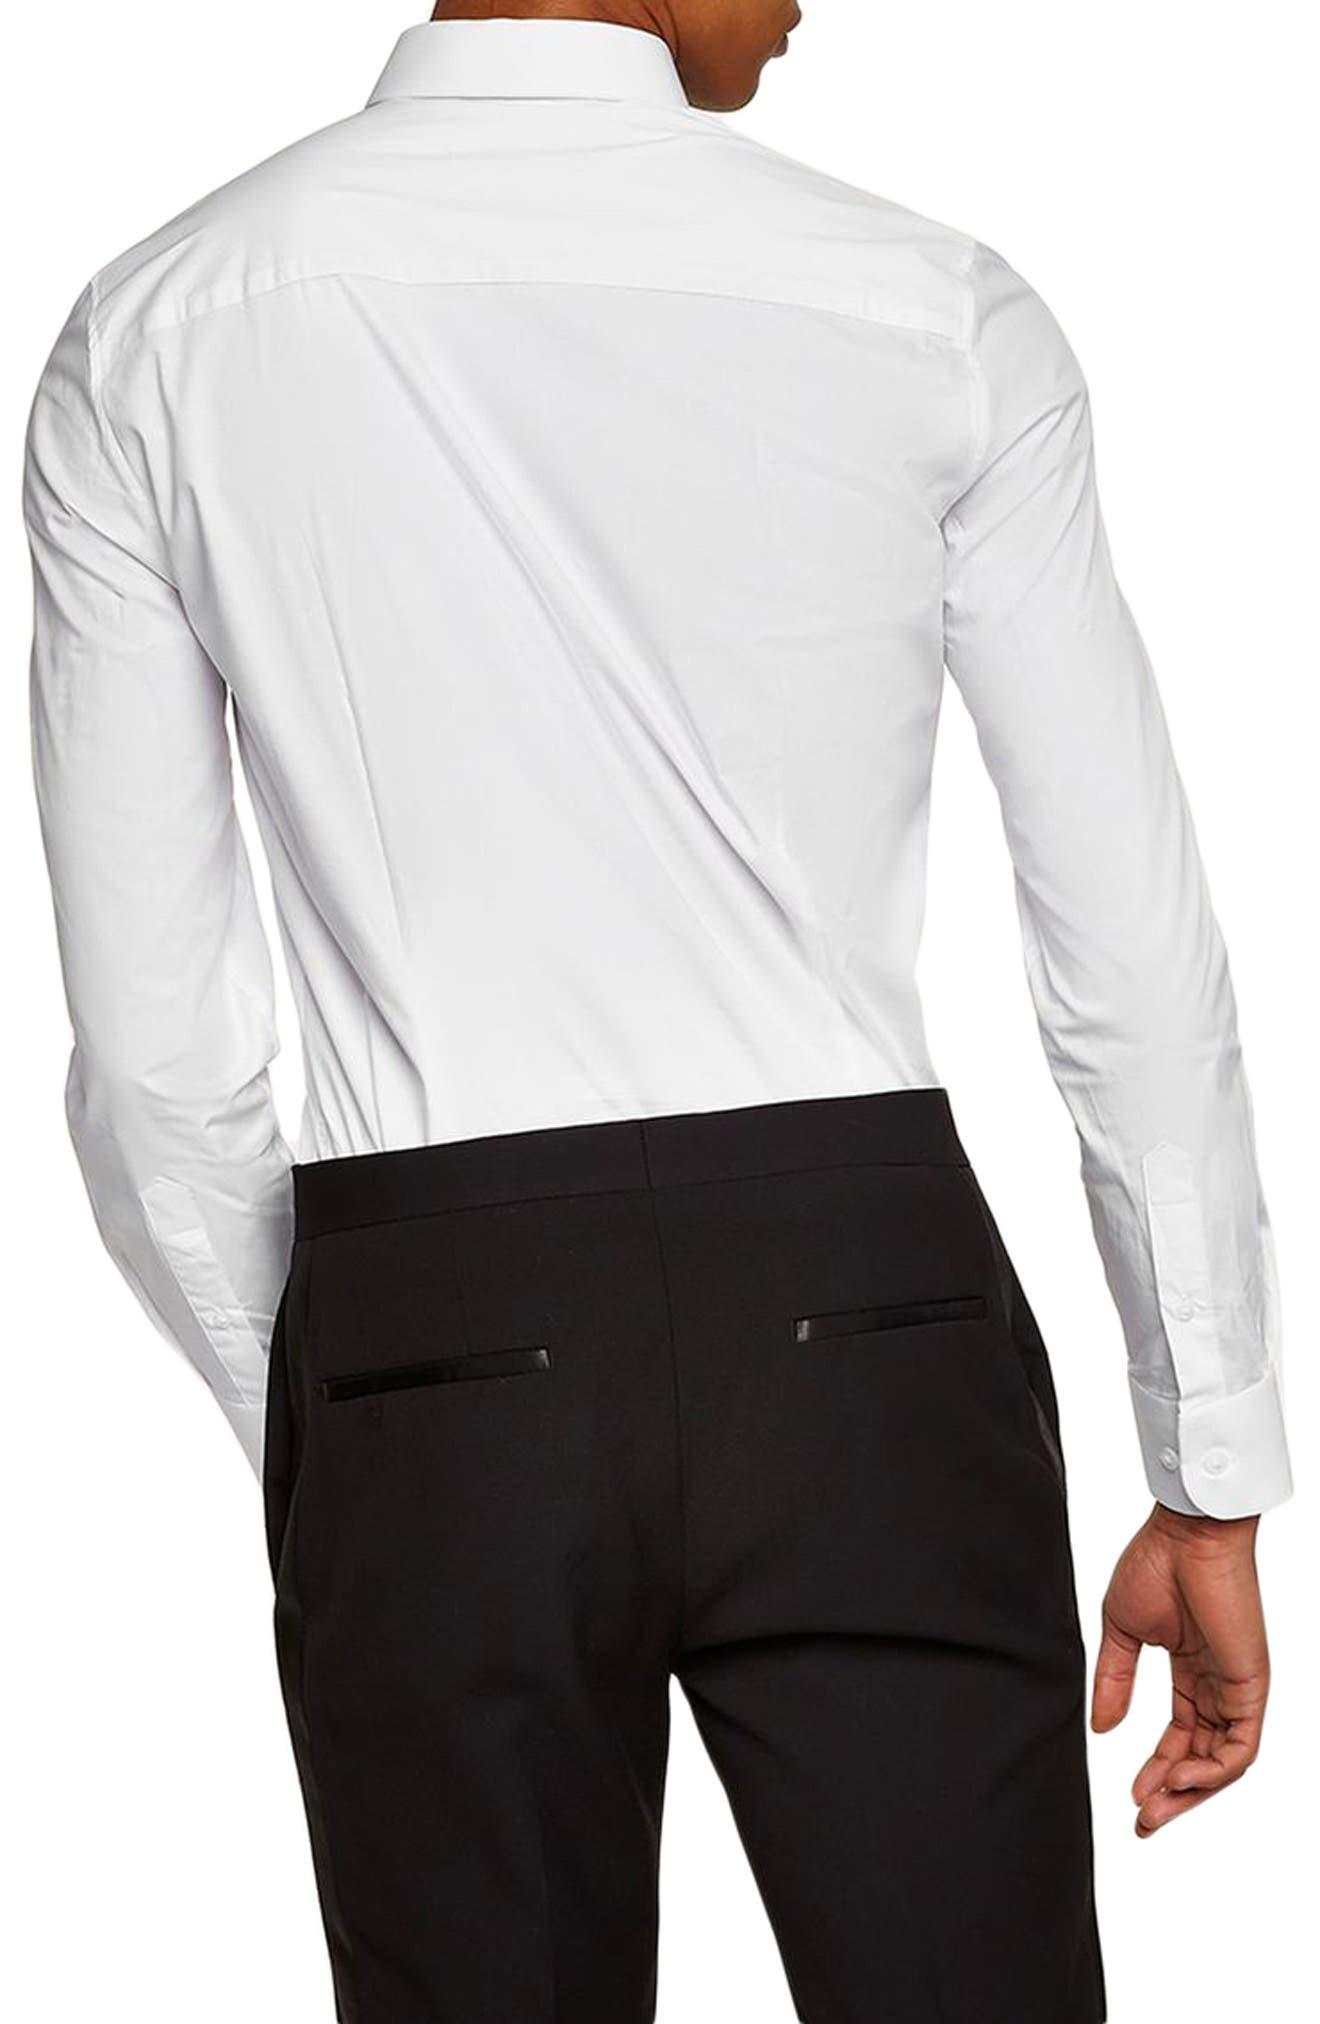 Penny Collar Shirt,                             Alternate thumbnail 3, color,                             White Multi